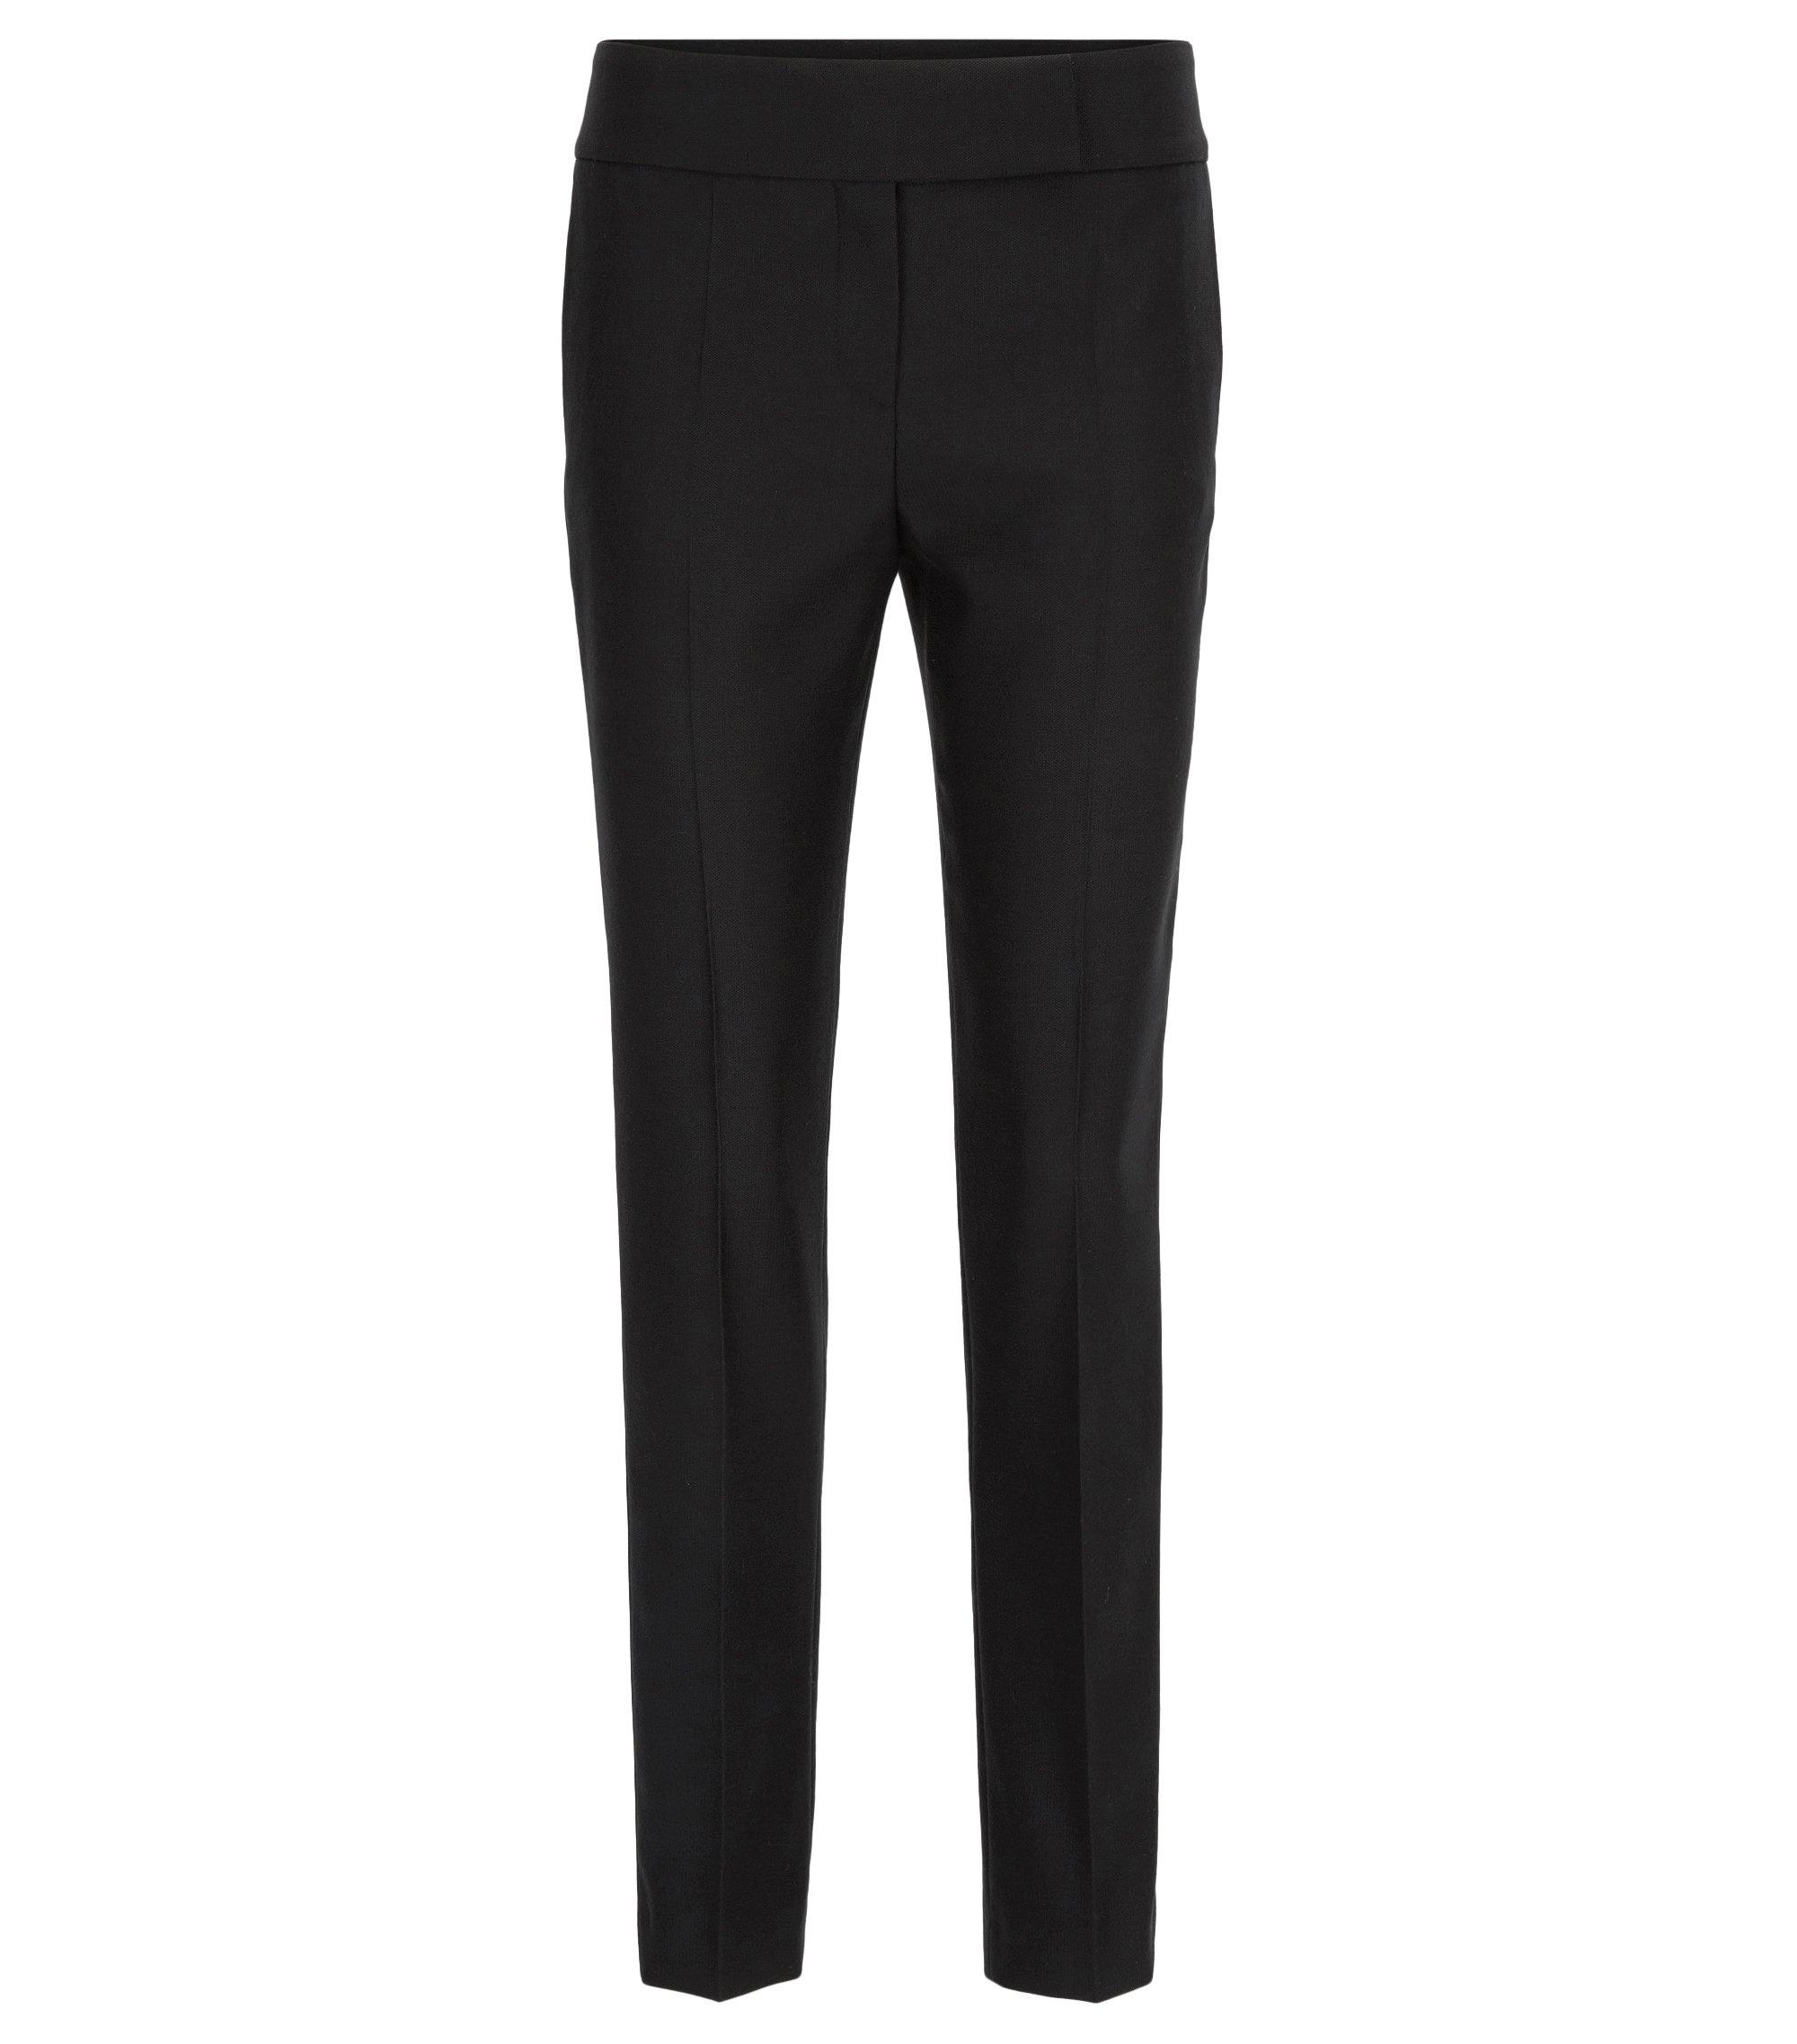 Virgin Wool Tuxedo Pant | Tivuna, Black